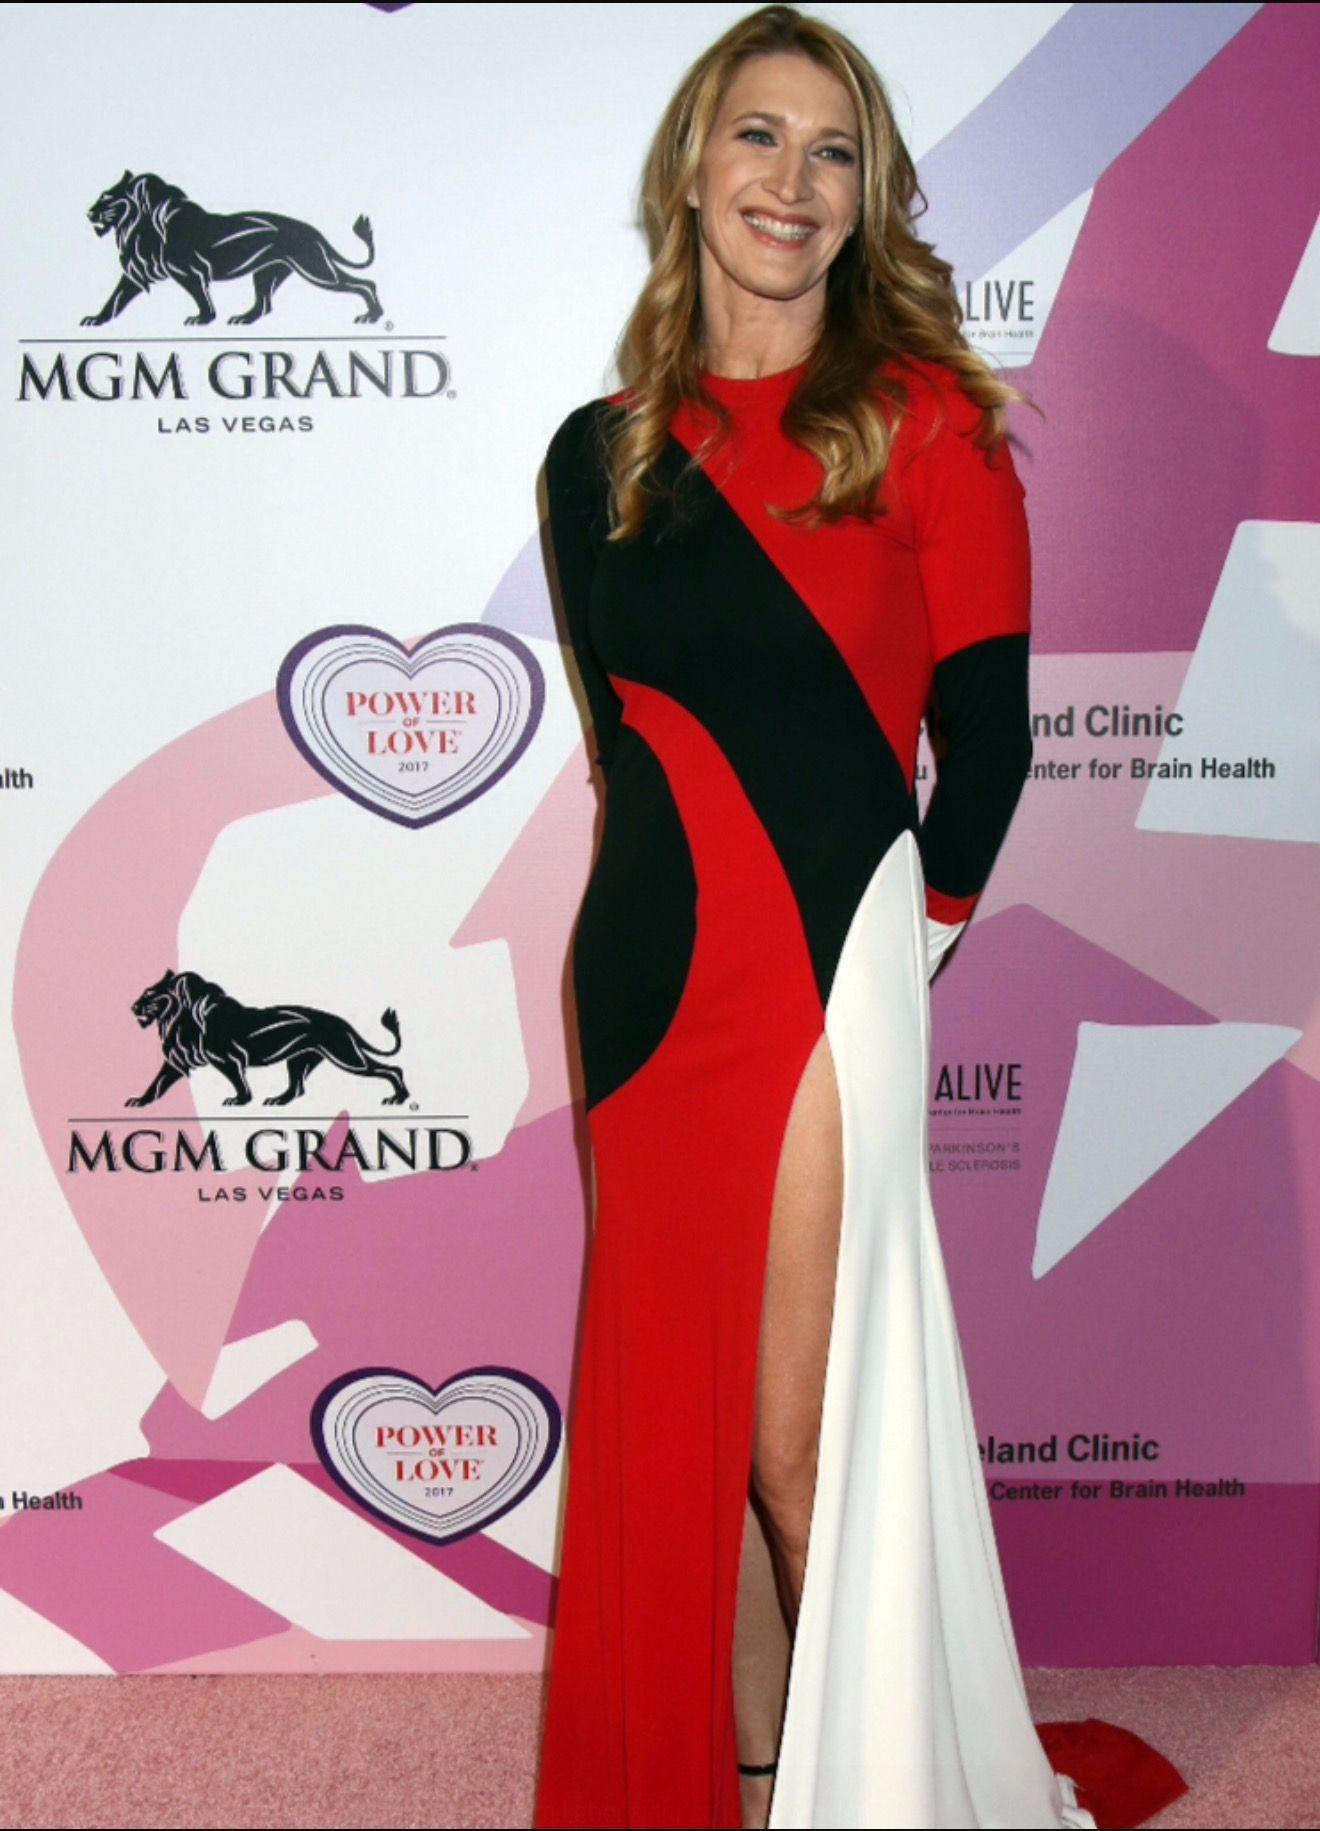 Pin By Luzi On Steffi Graf Steffi Graf Mgm Grand Las Vegas Formal Dresses